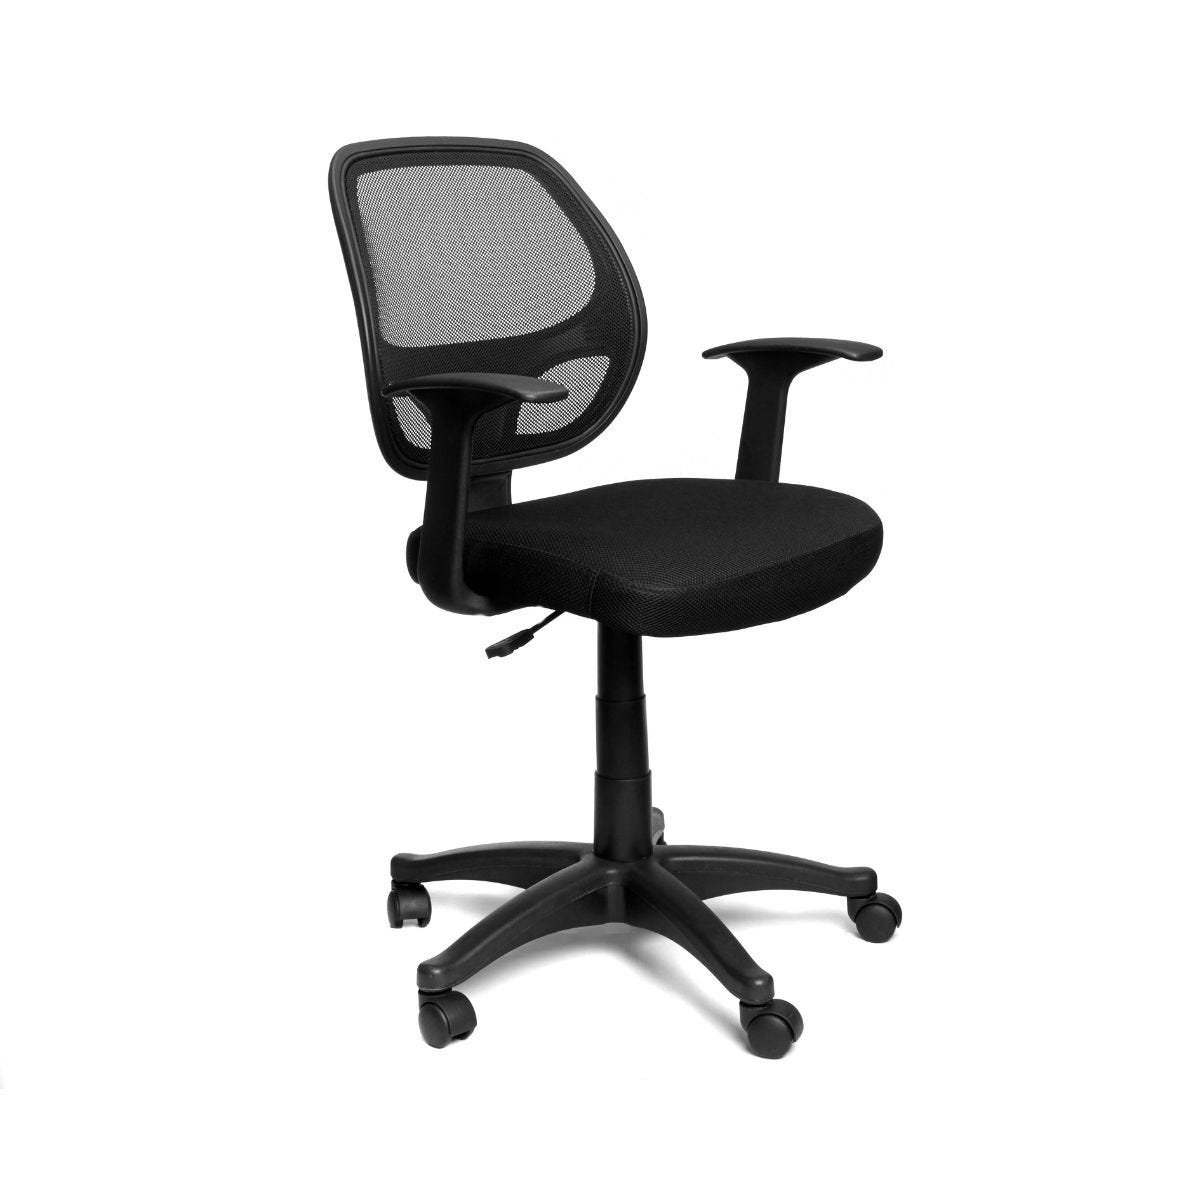 Mesh fice Chairs & Seating Furniture & Storage Ryman